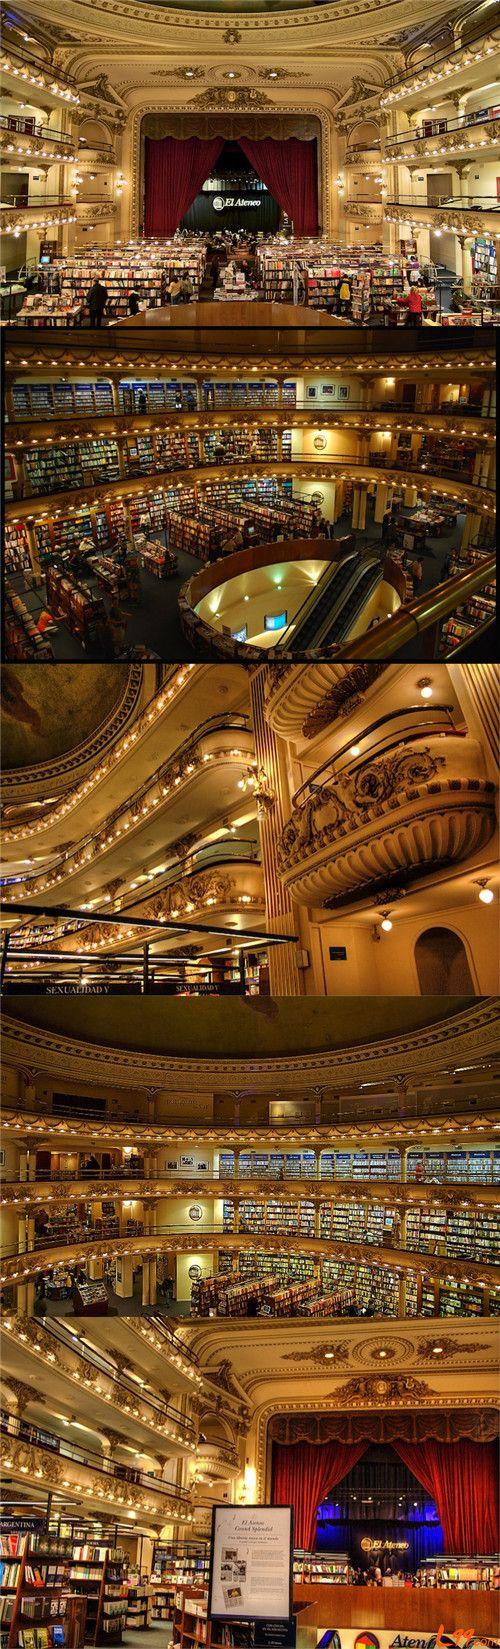 El Ateneo Grand Splendid in Recoleta